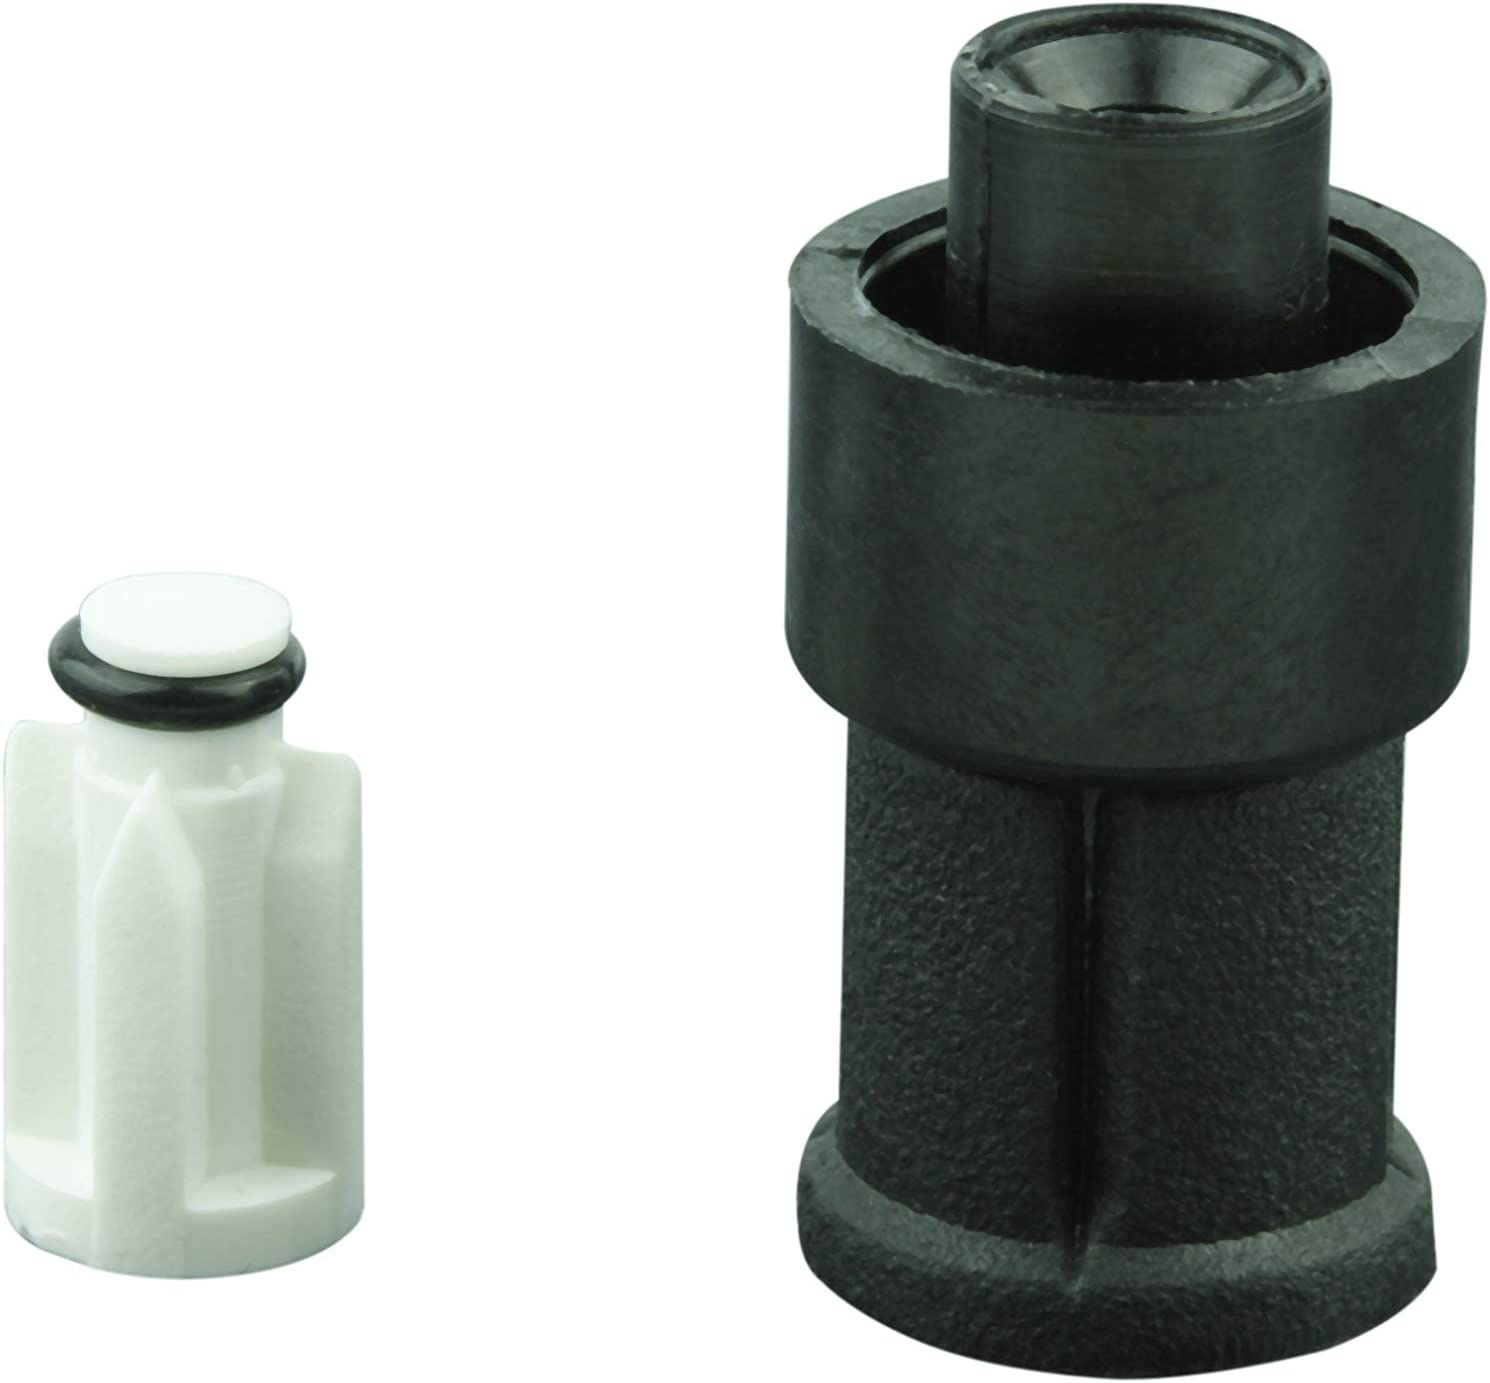 Multiquick 3 5 7 hand blender repair kit gear motor couplin set for braun